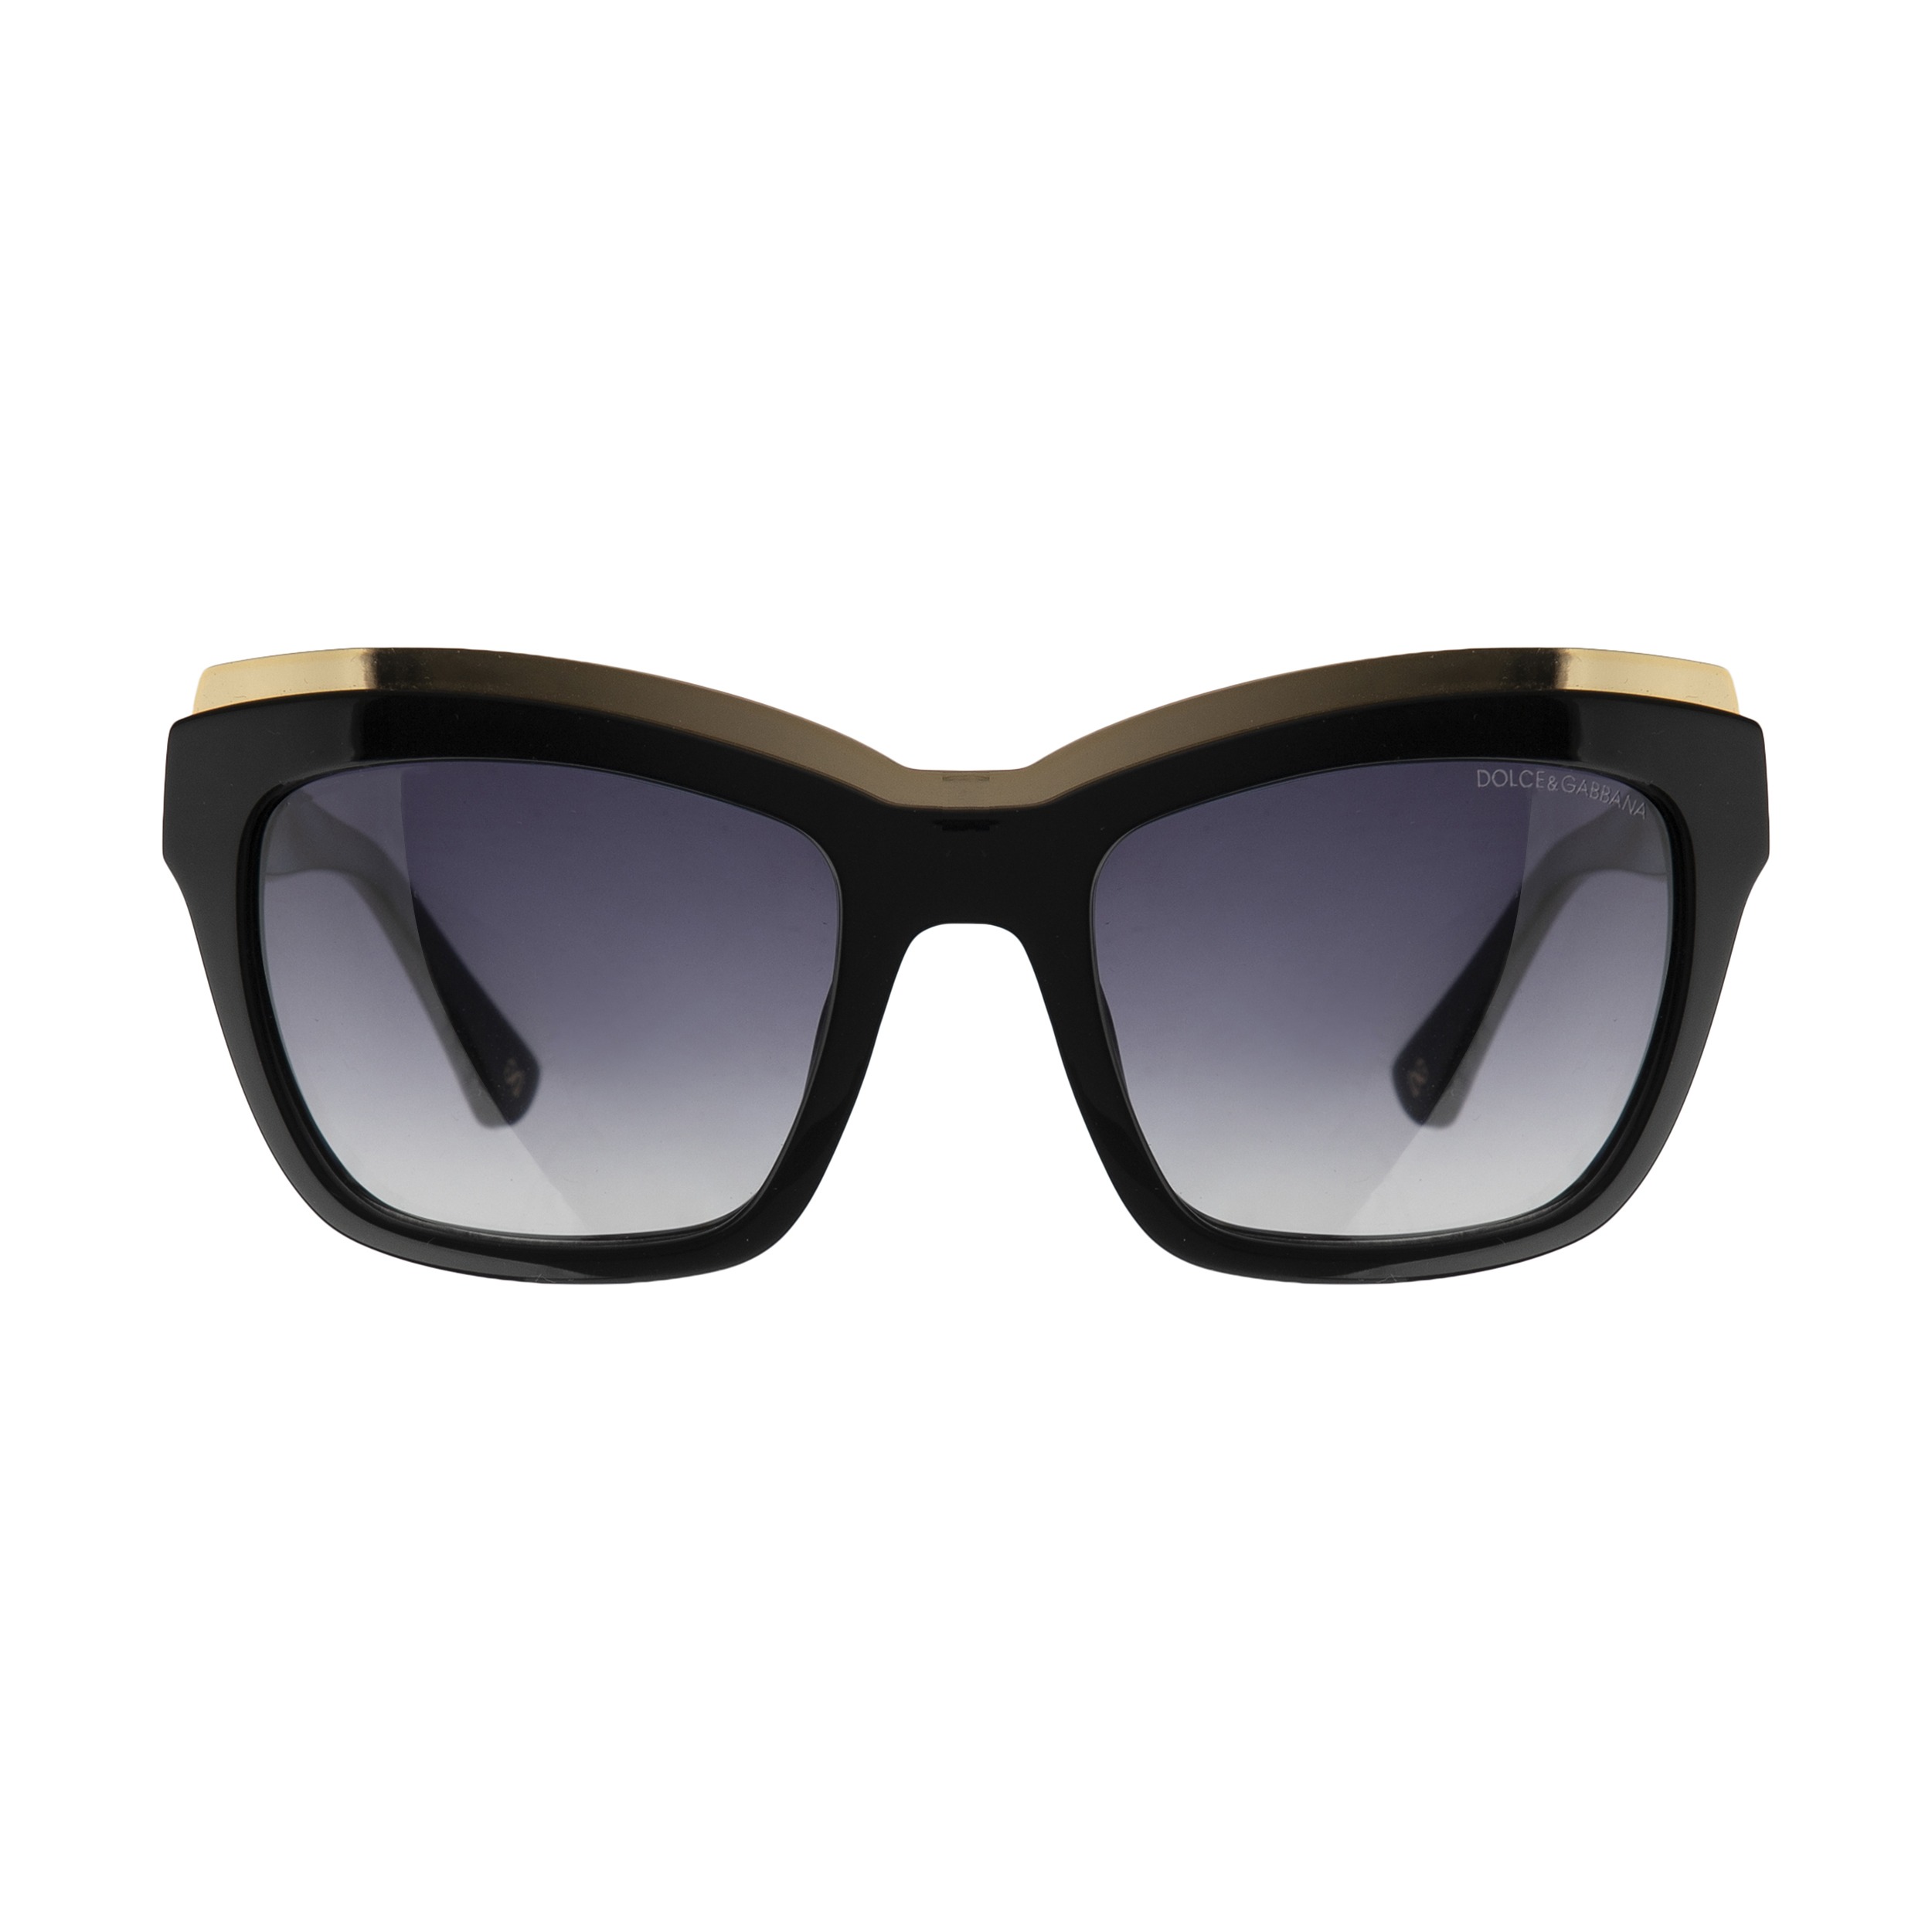 عینک آفتابی  دولچه اند گابانا مدل 4268